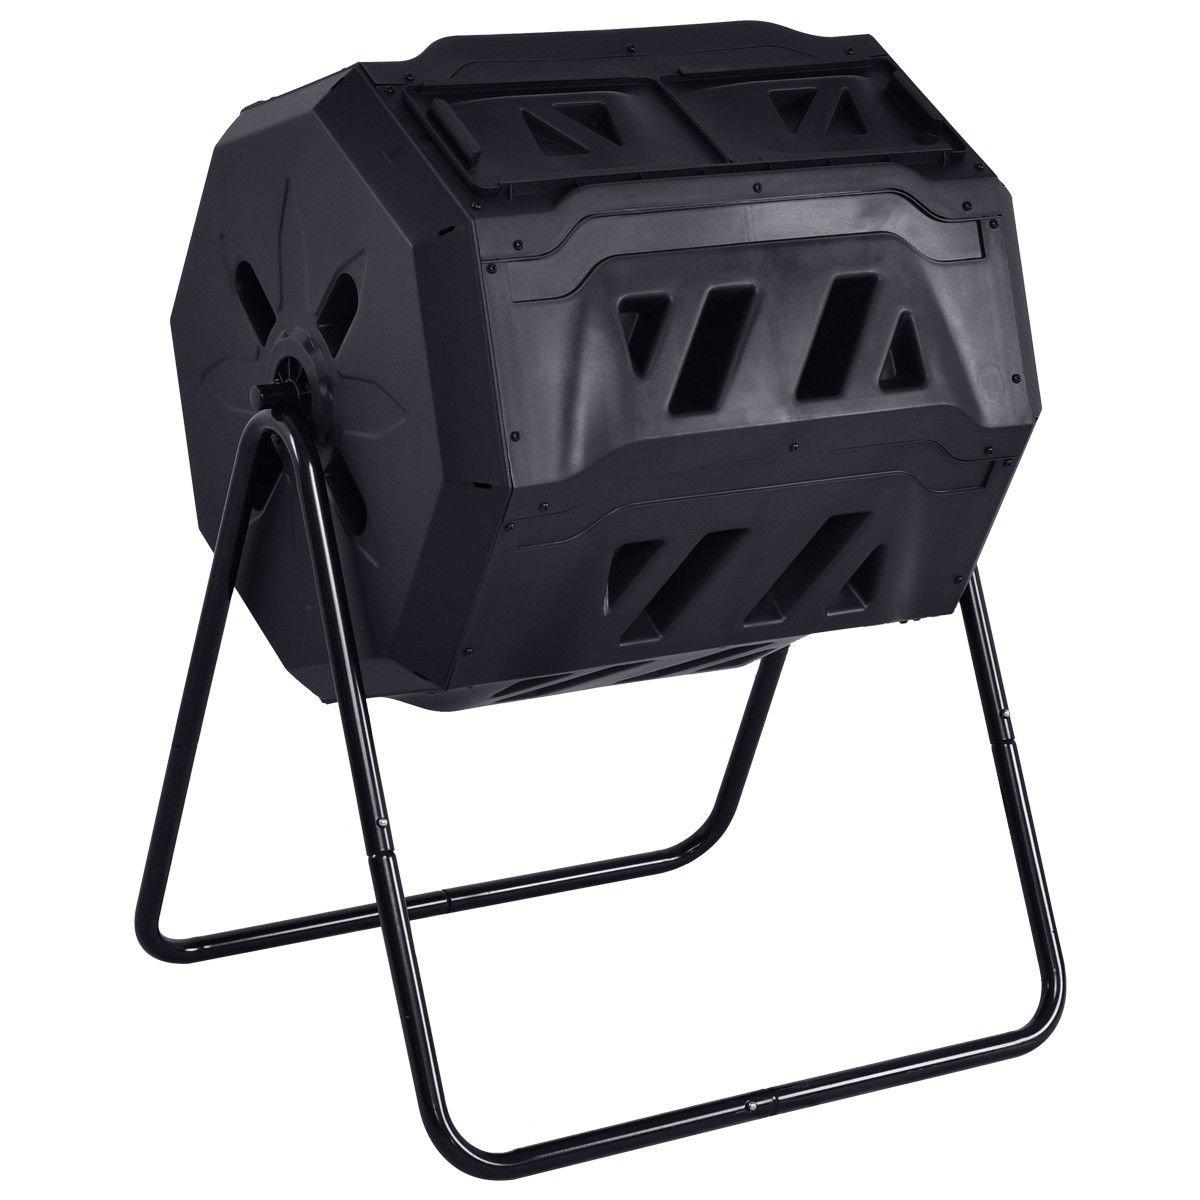 Black 42 Gallon Compost Tumbler Garden Waste Bin w/ Adjustable Air Vents